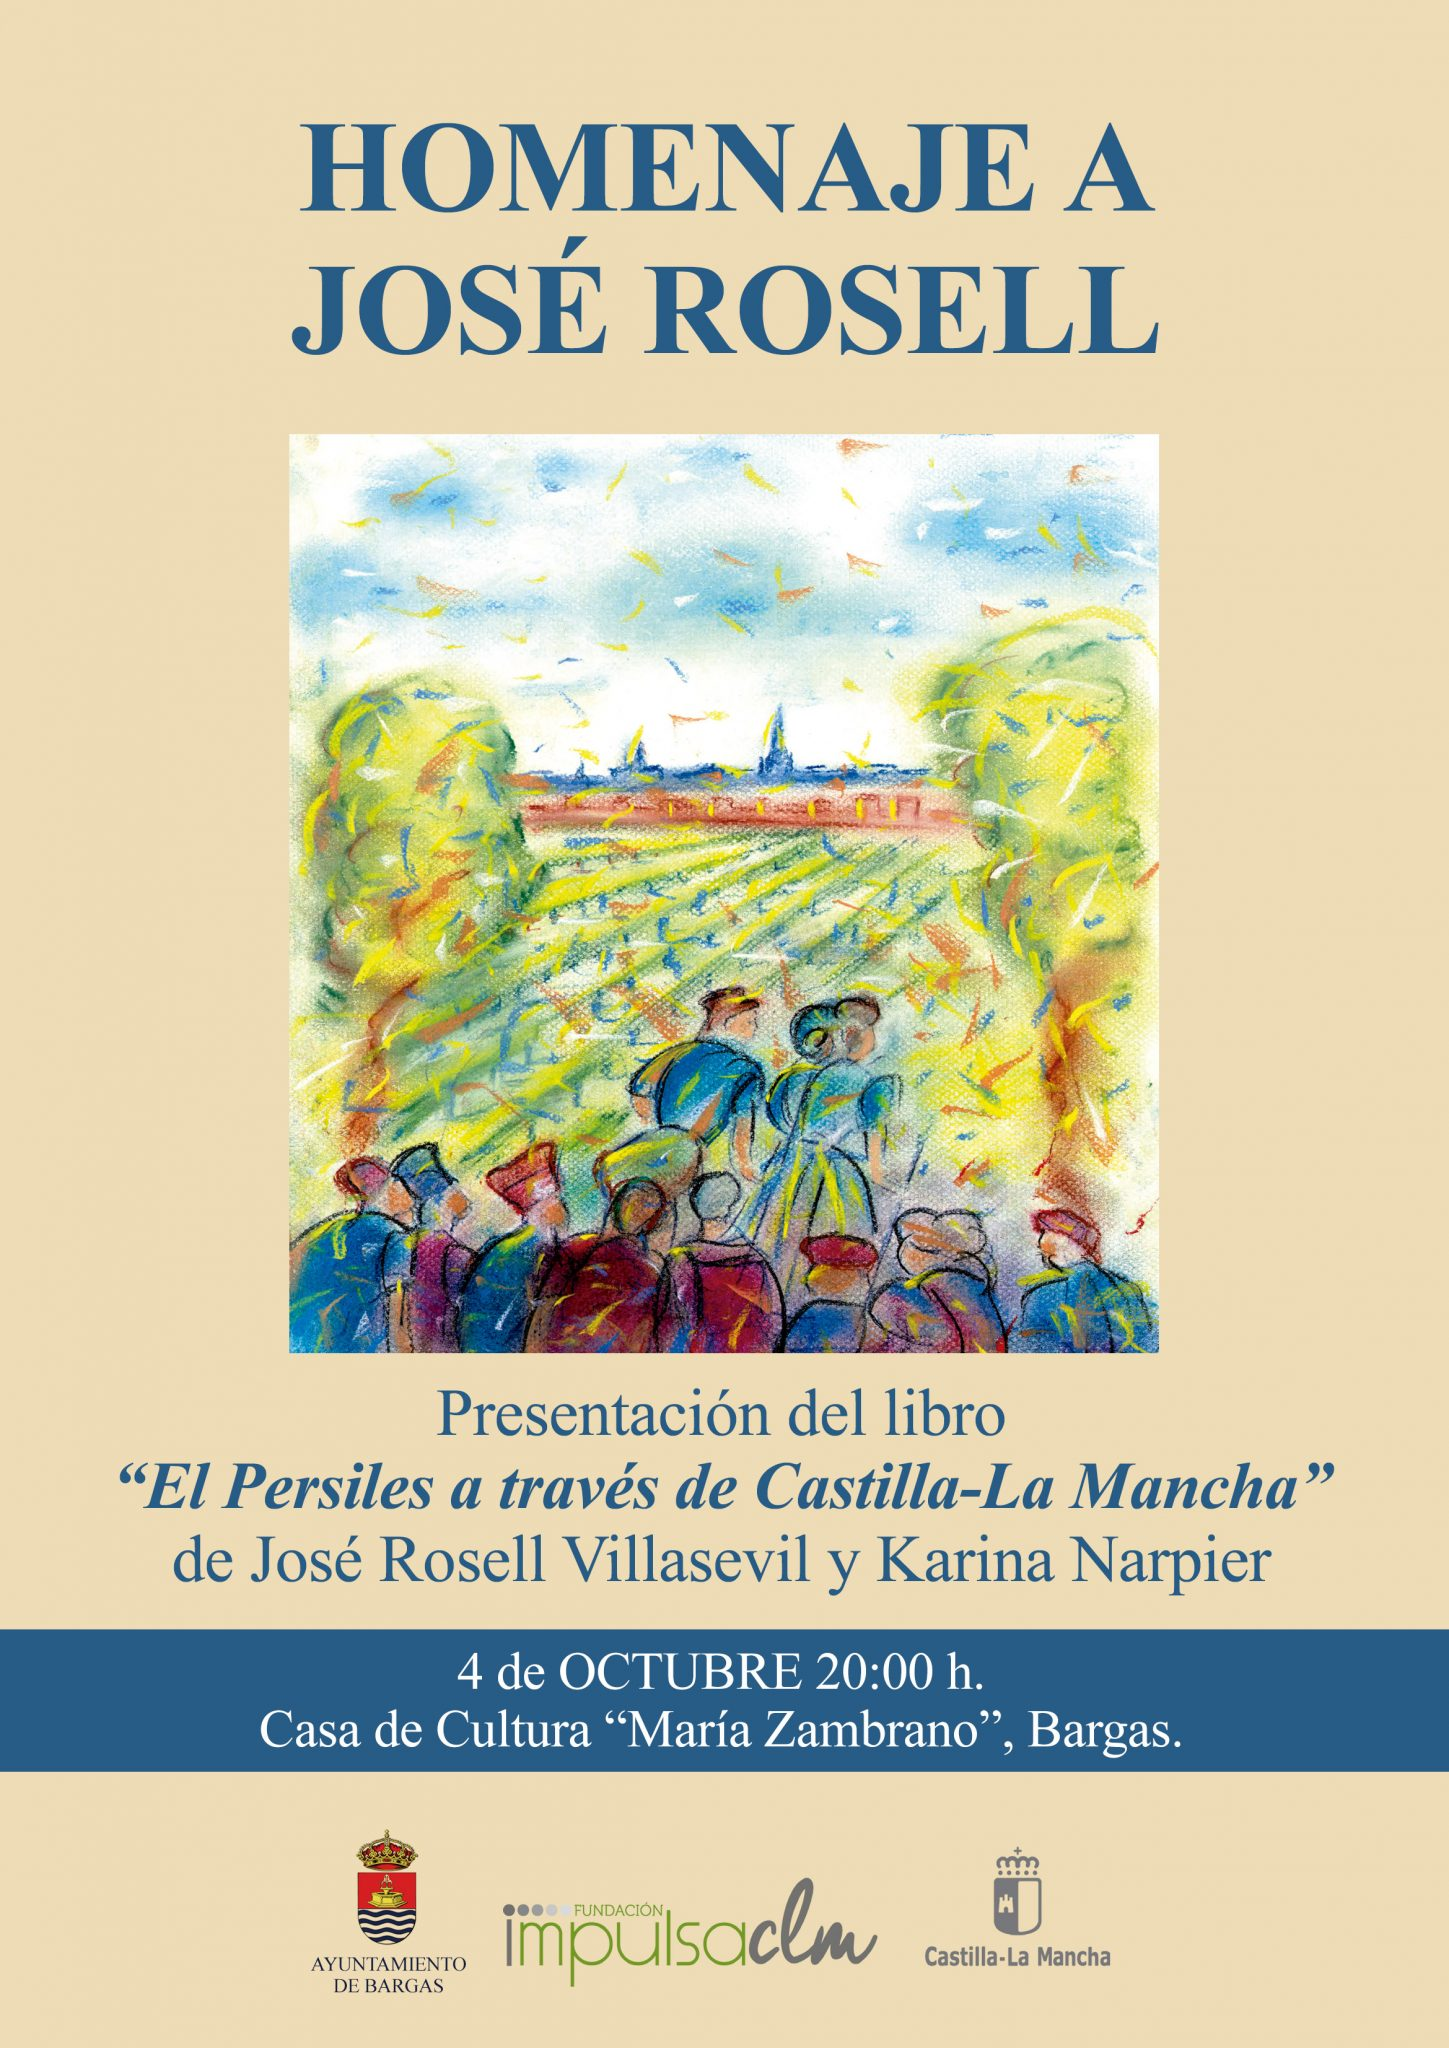 Homenaje a José Rosell